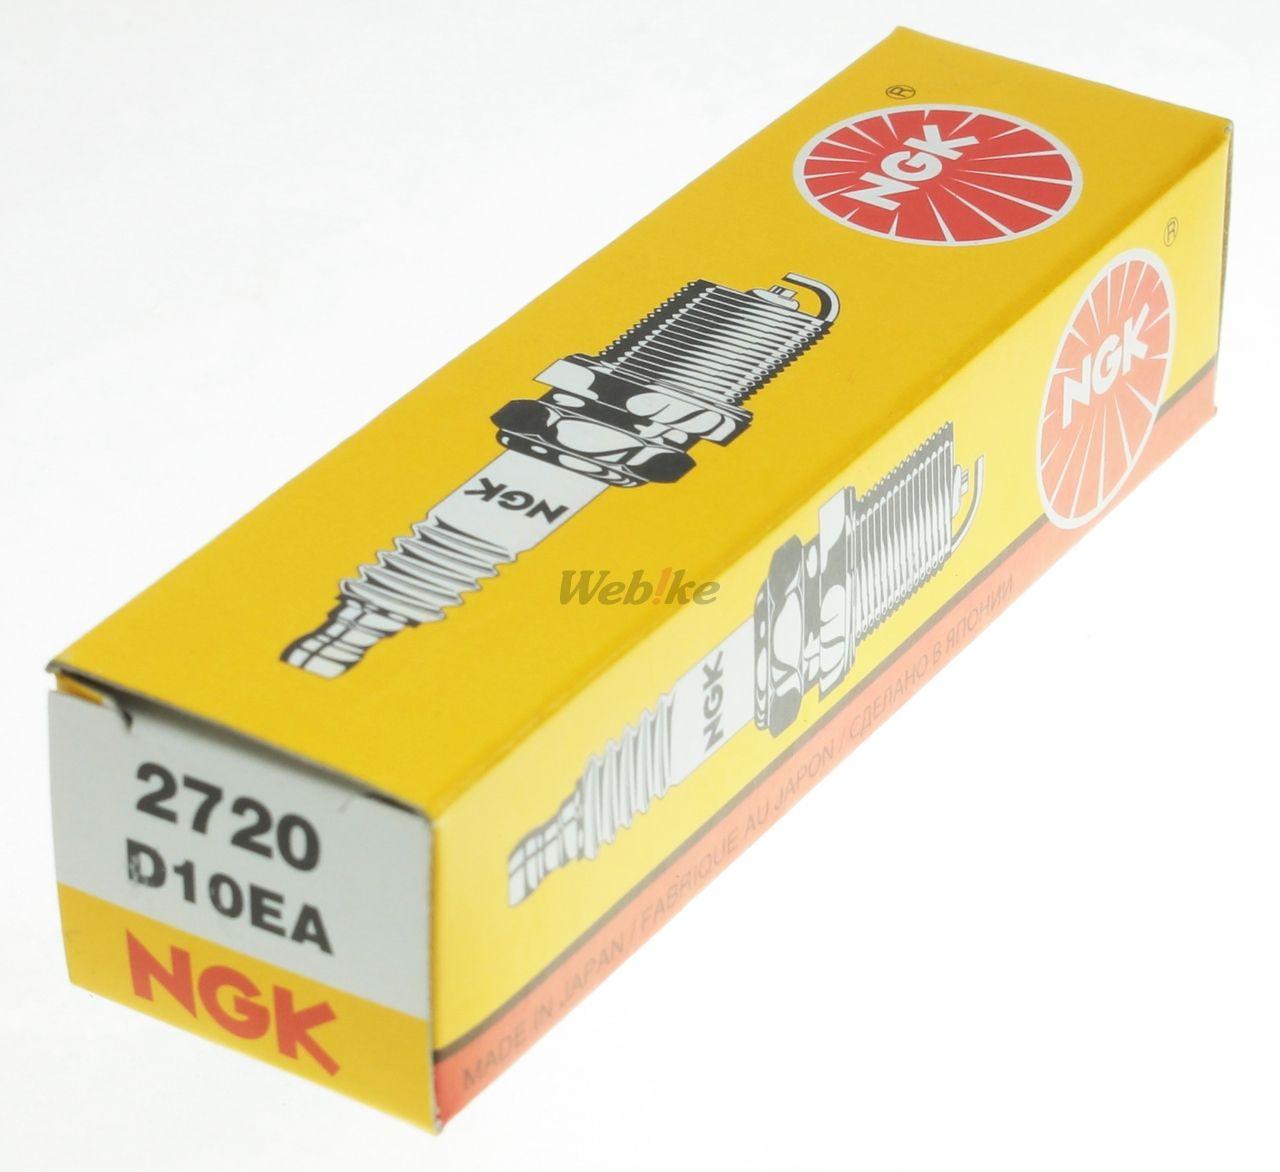 【NGK】標準型 火星塞 D10EA 2720 - 「Webike-摩托百貨」